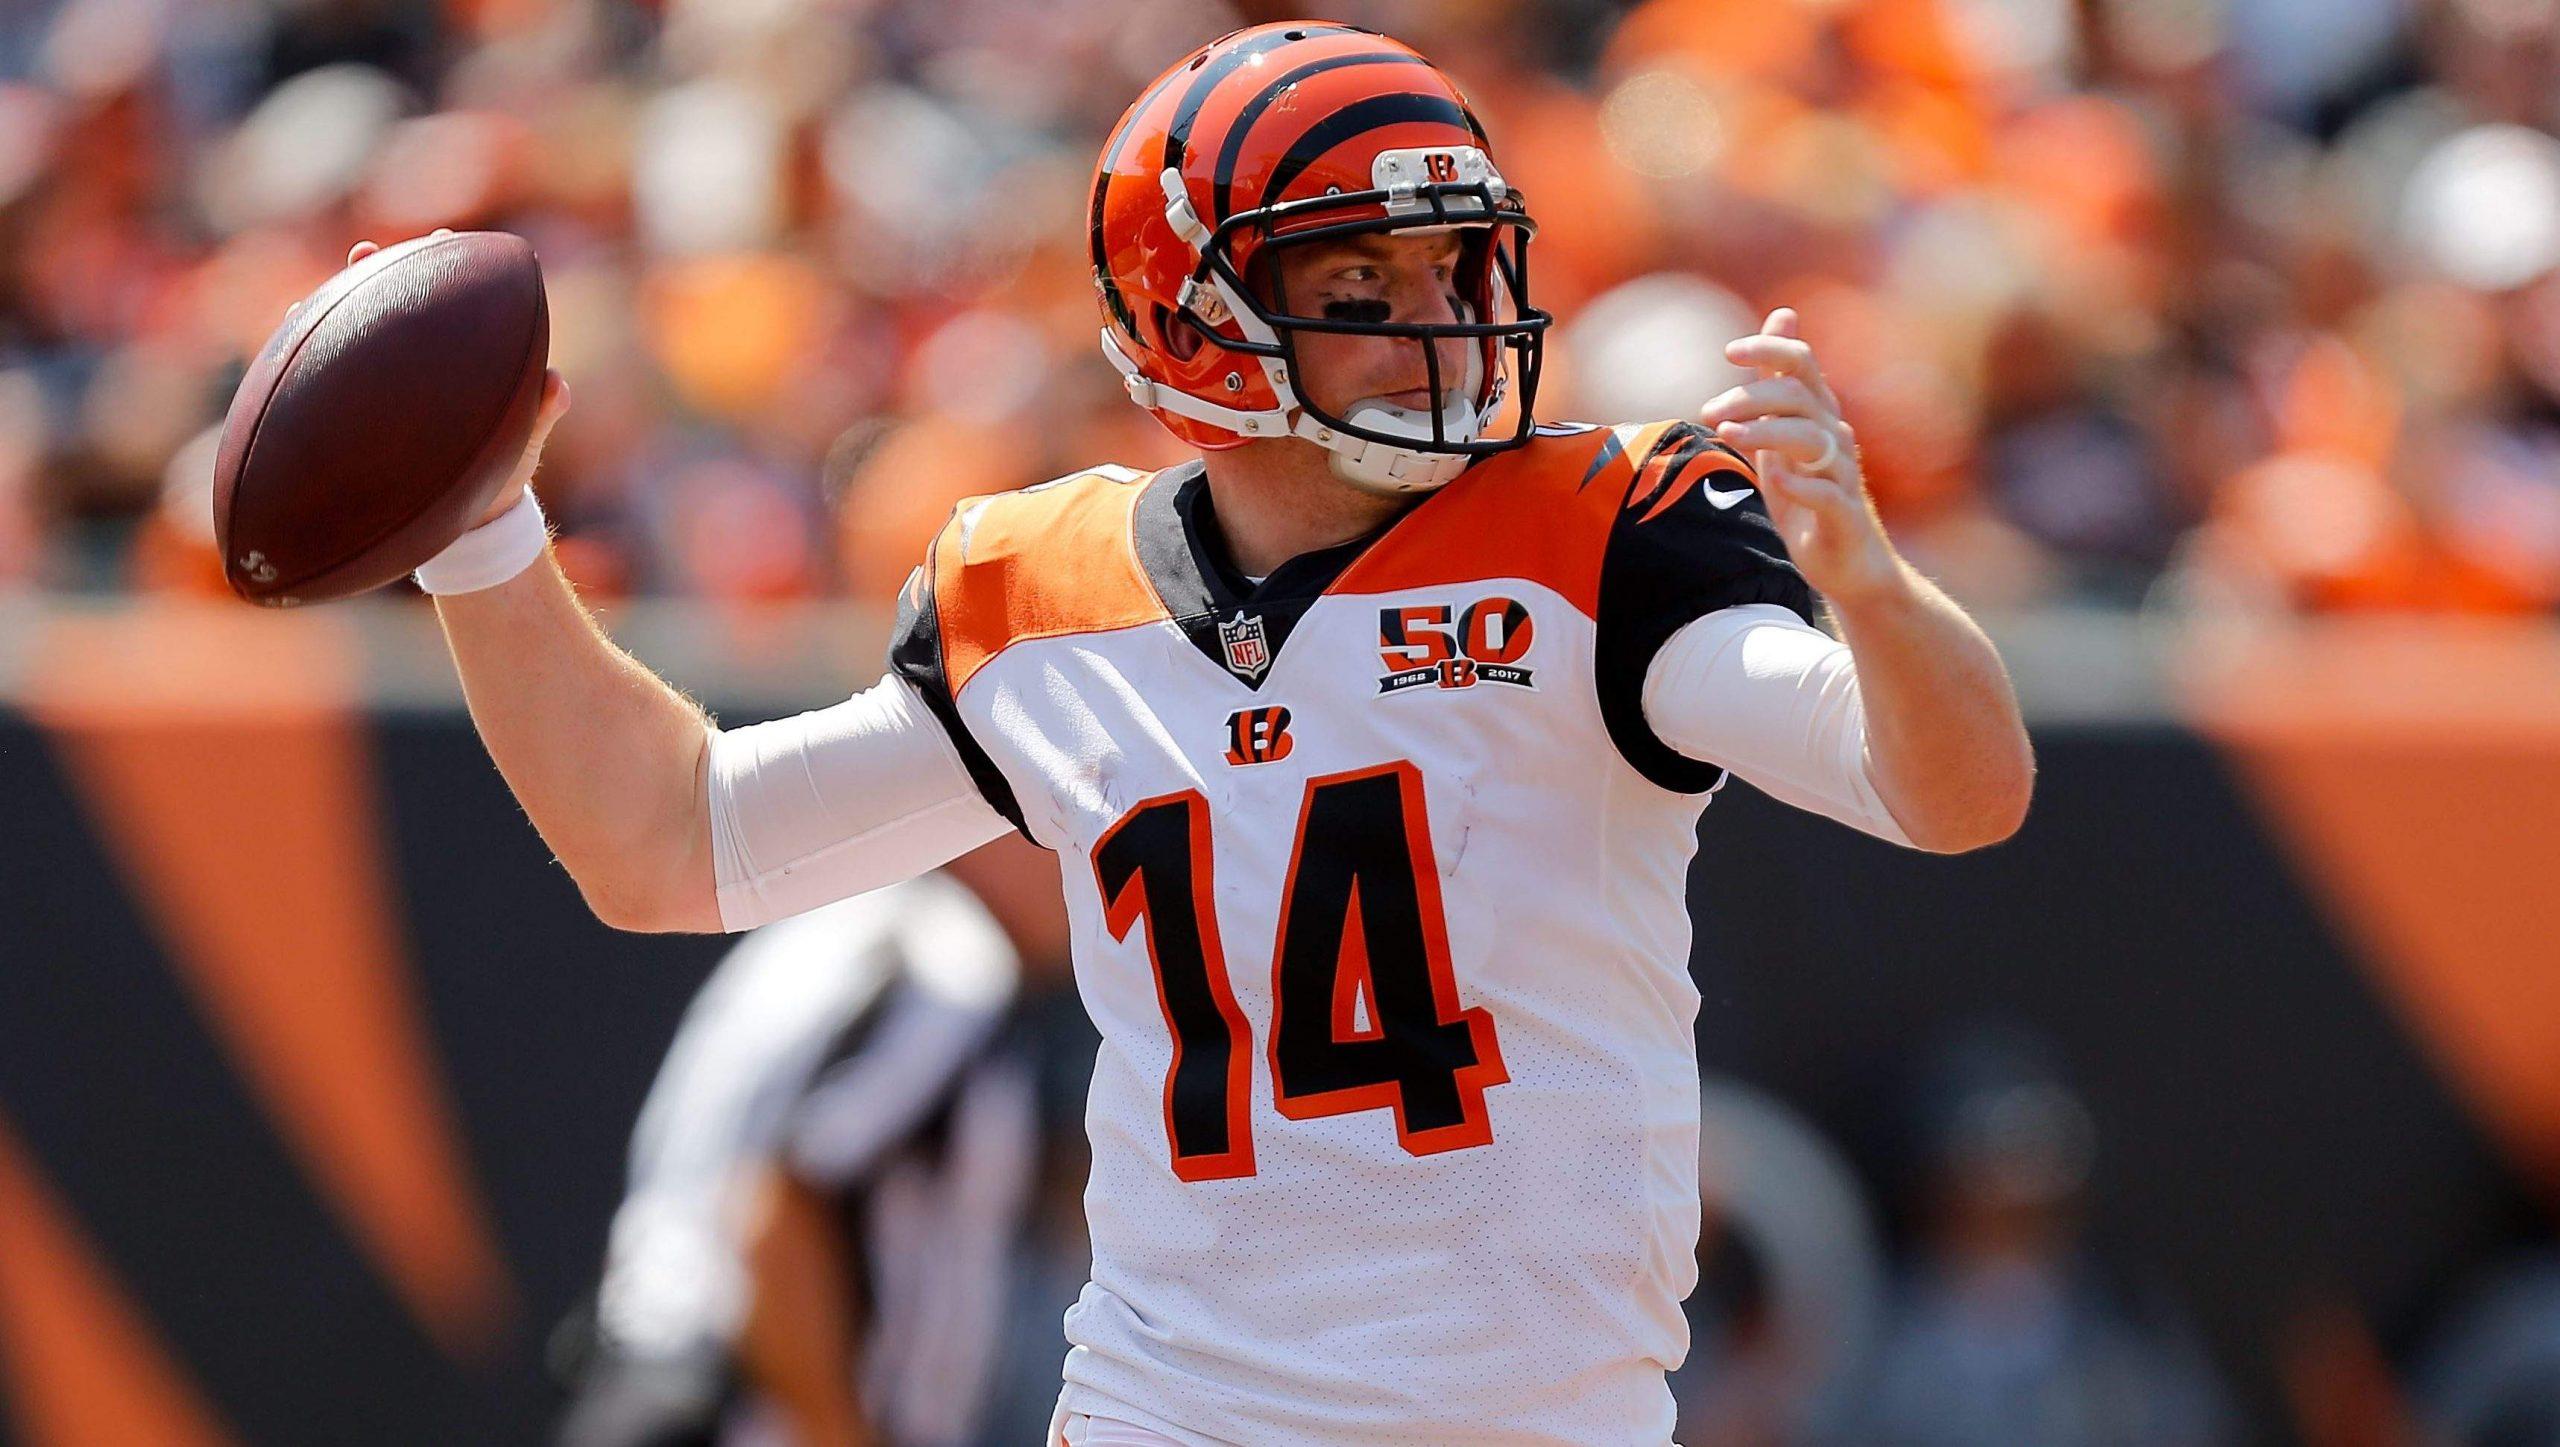 Cincinnati Bengals, QB Oyuncusu Andy Dalton'u Serbest Bırakıyor!